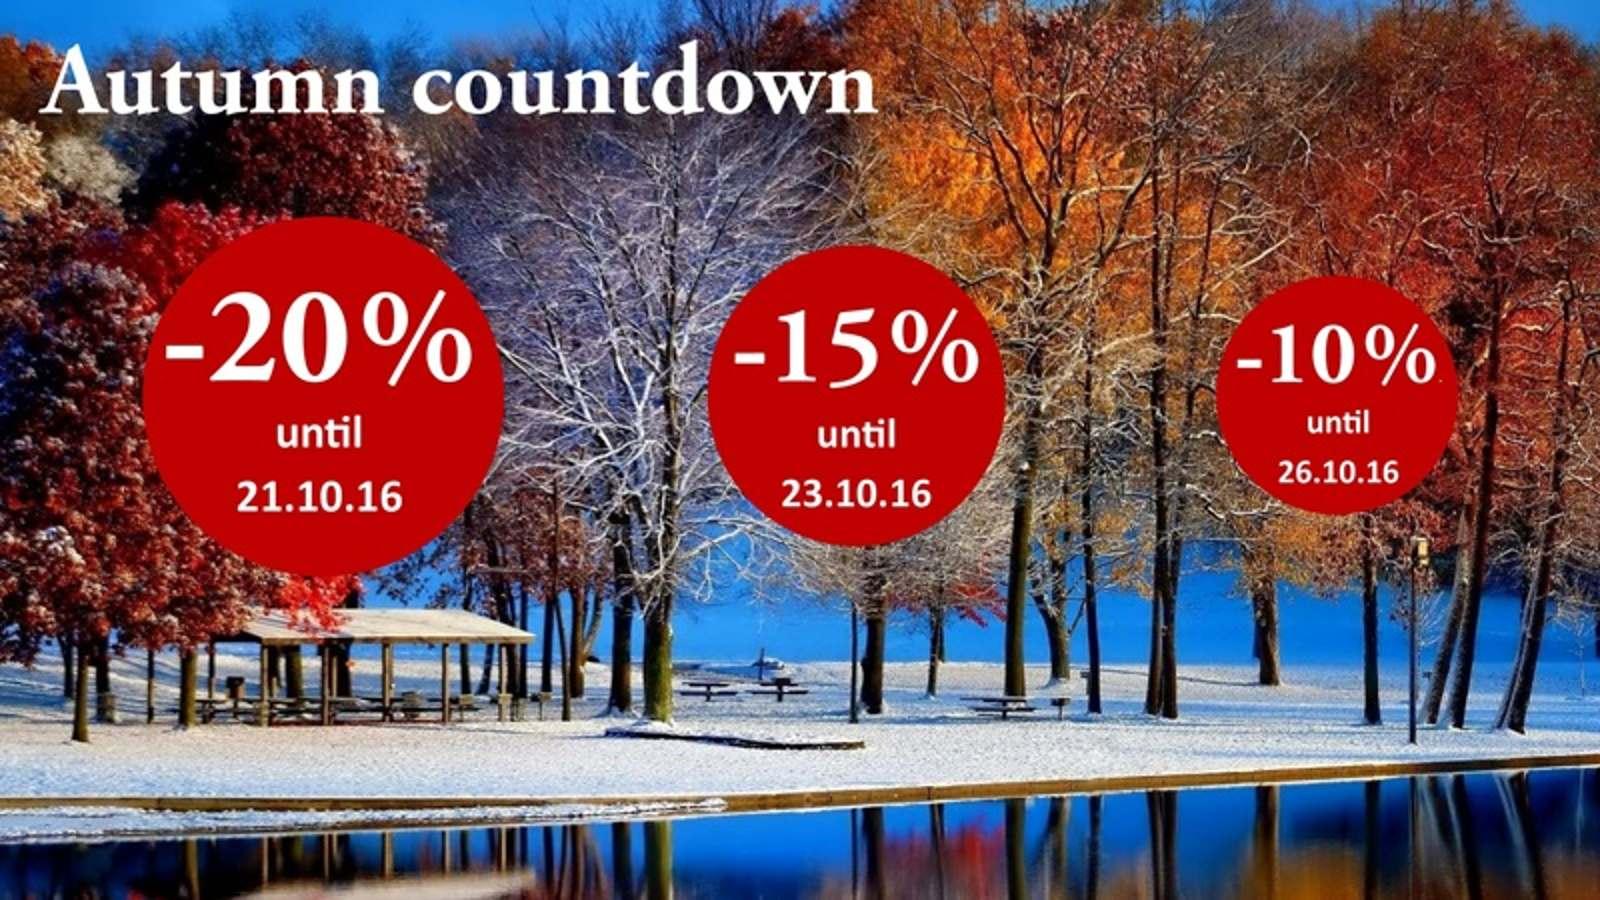 20% - 15% - 10% - be quick, it's worth it!